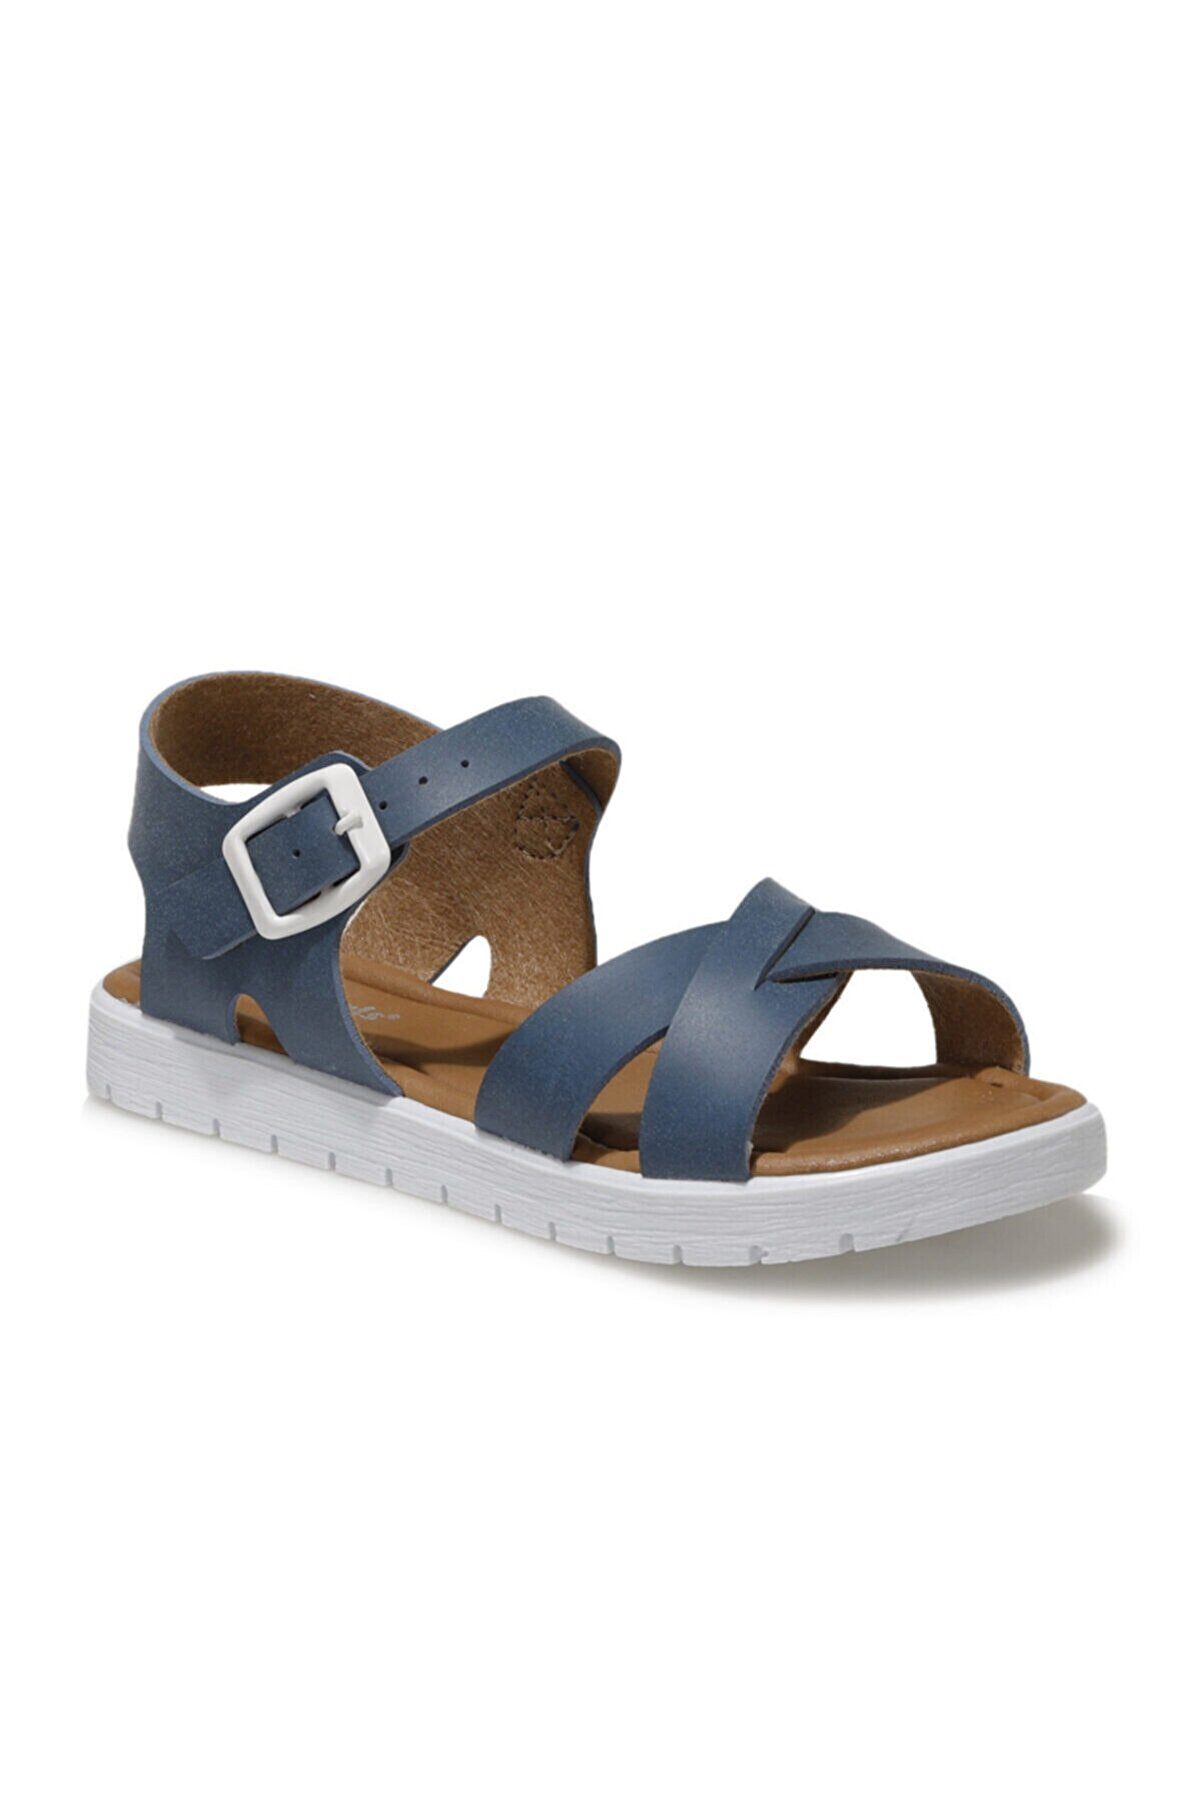 Polaris 508159.F1FX Lacivert Kız Çocuk Sandalet 101010666